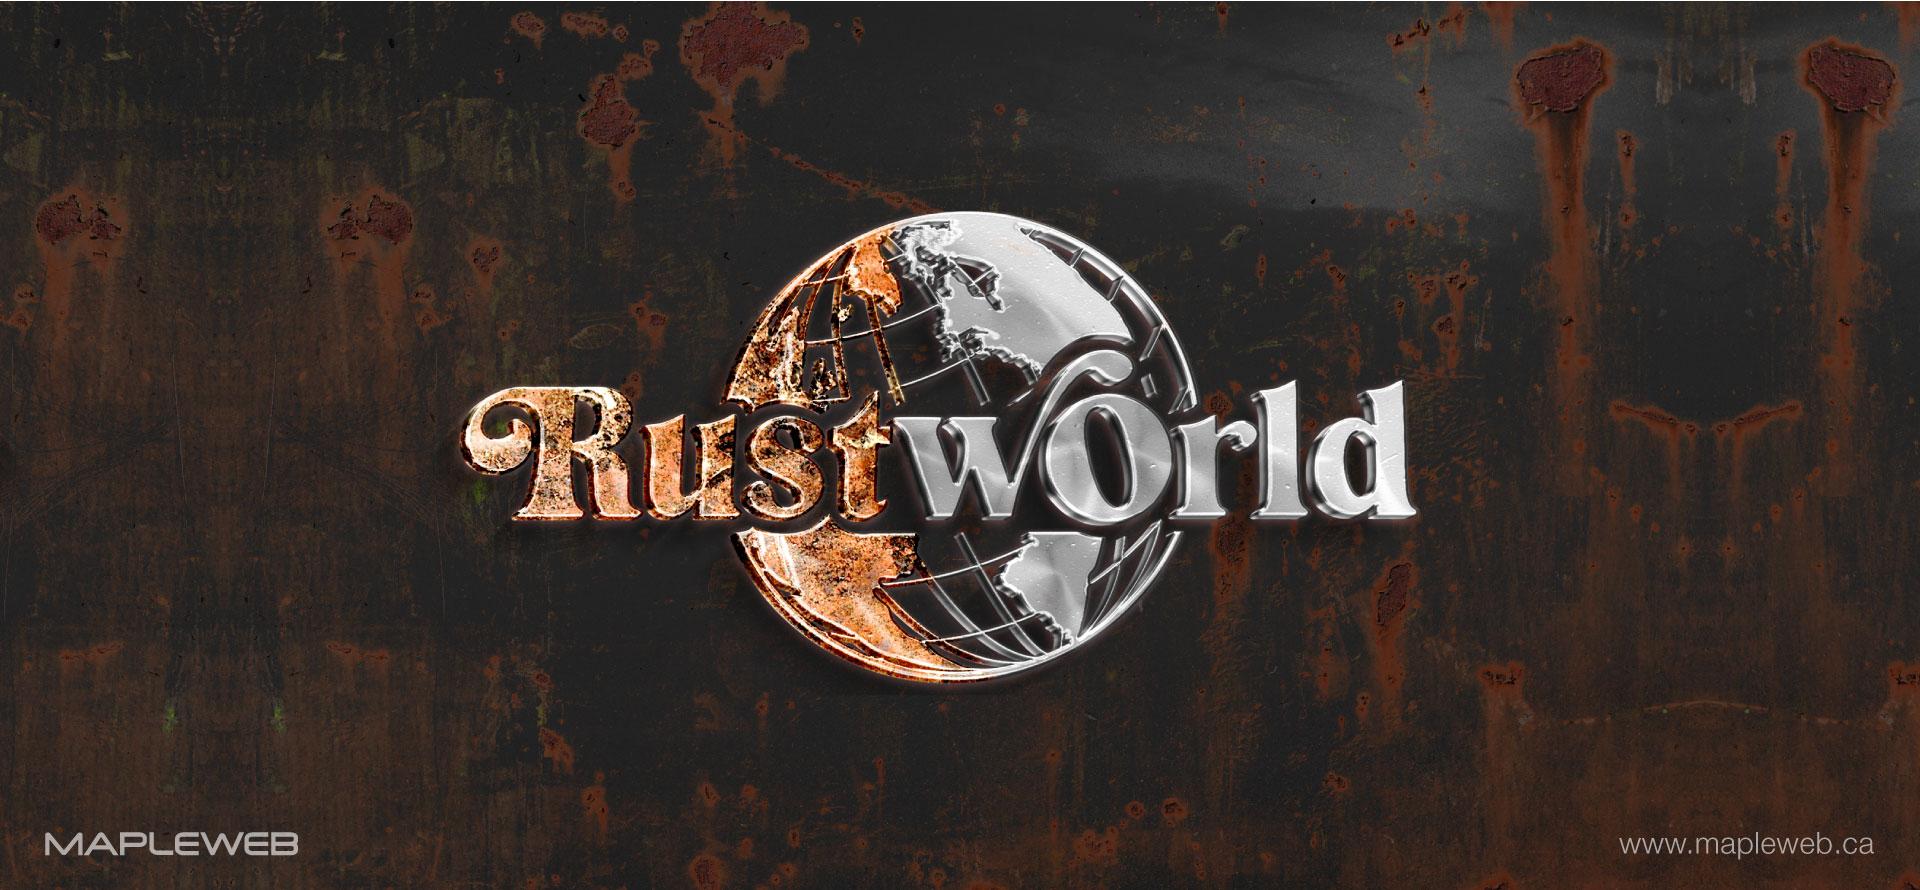 rust-world-brand-logo-design-by-mapleweb-vancouver-canada-brown-rust-mocks